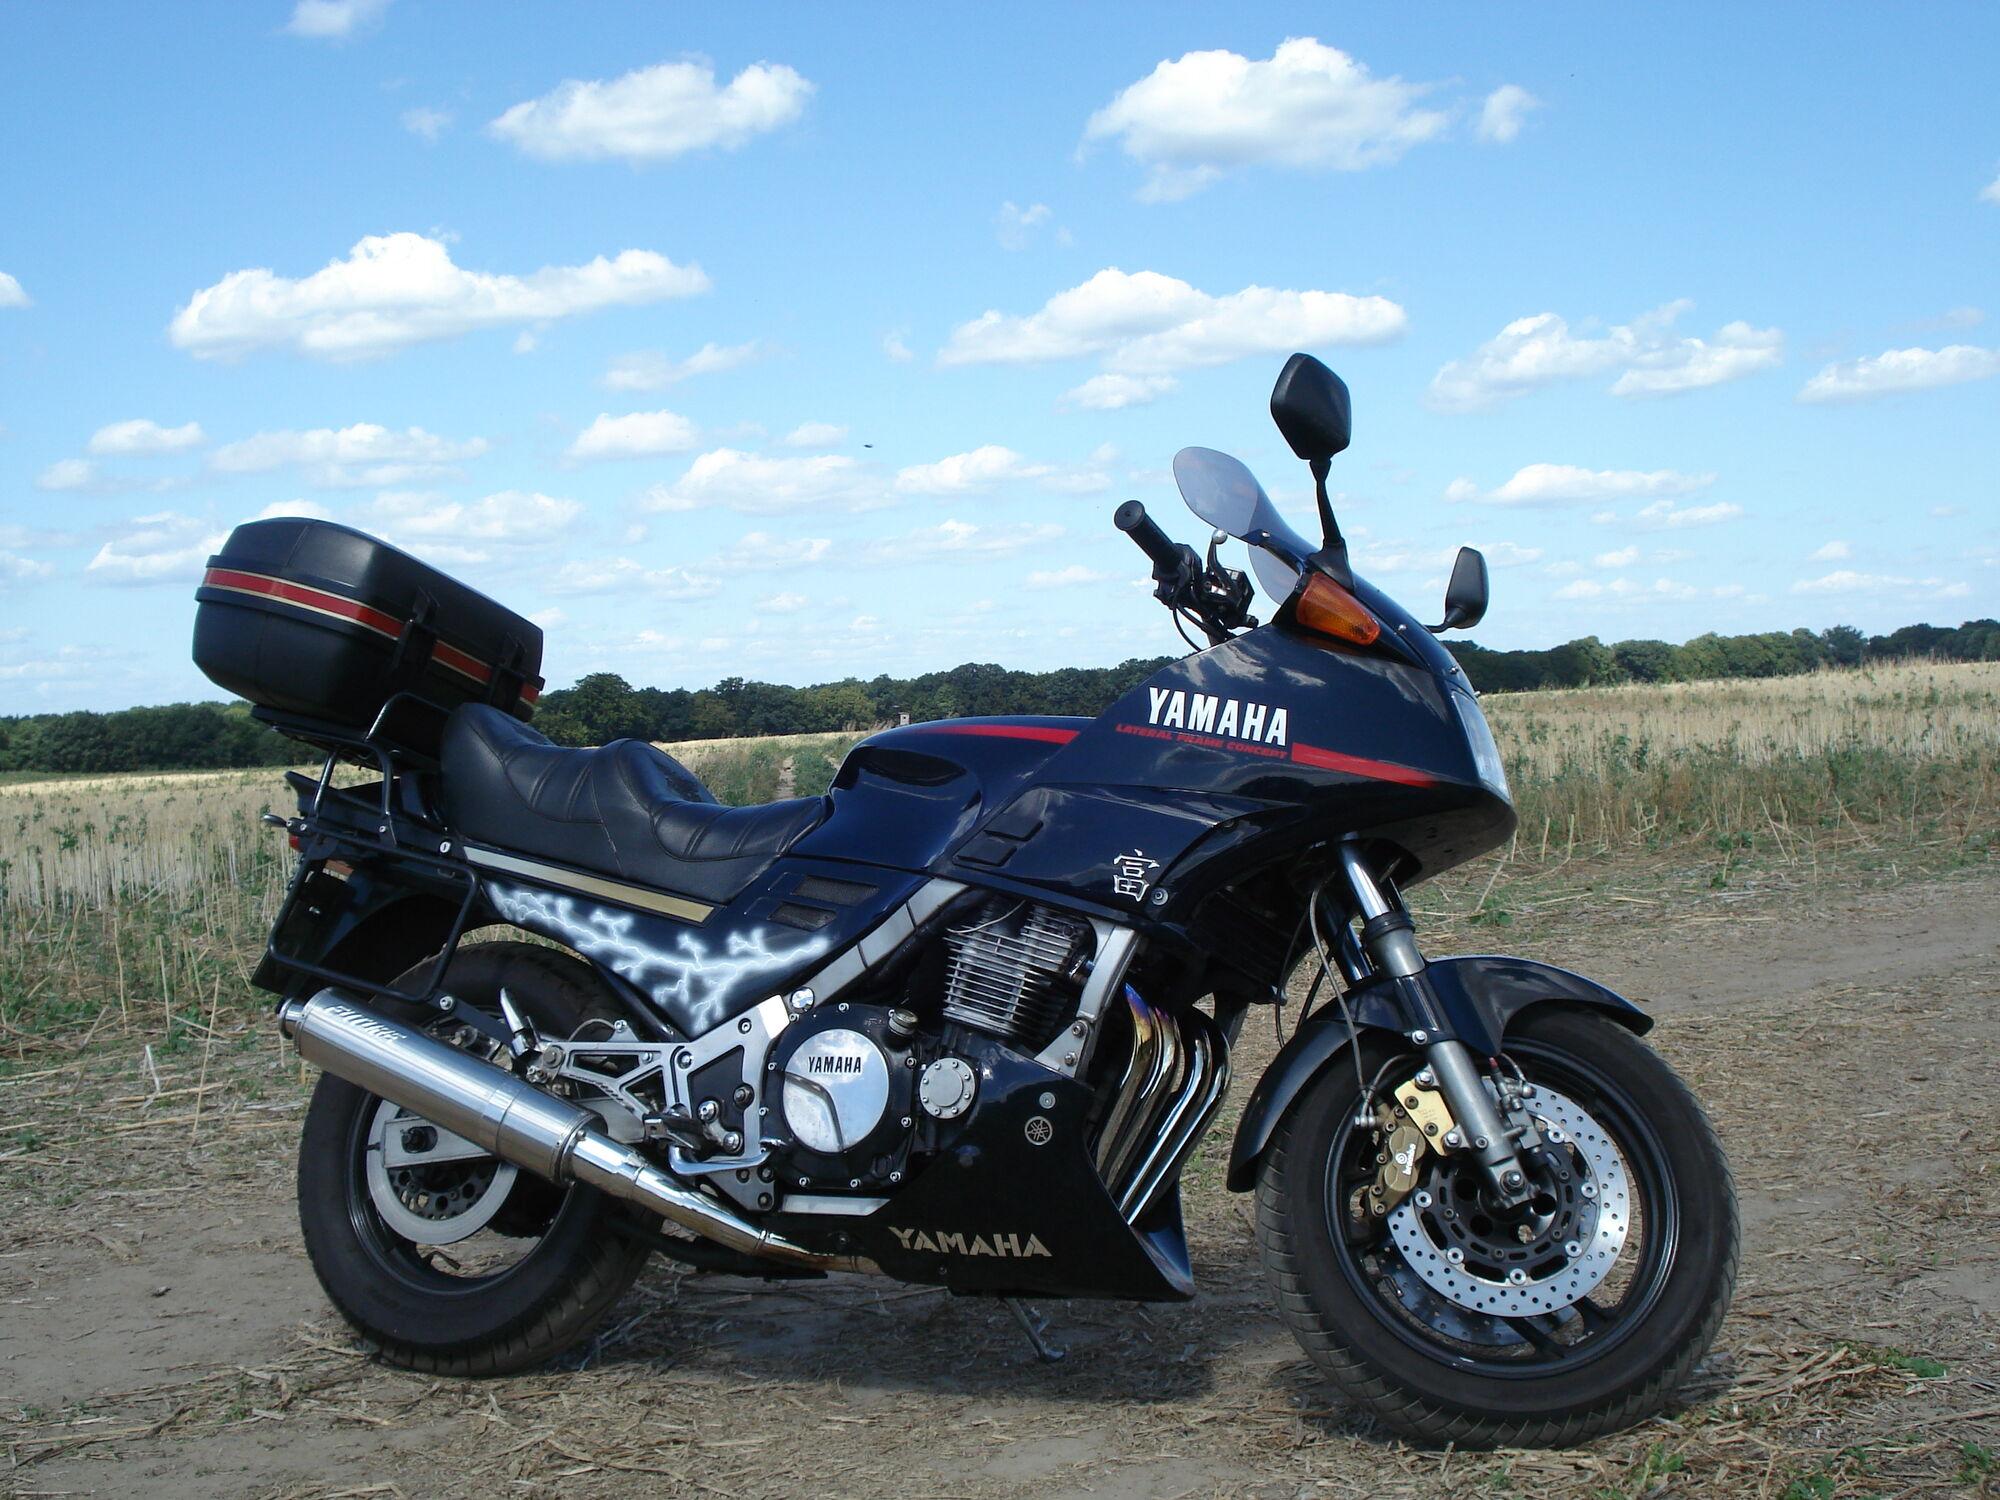 Historia Yamaha FJ FJR Timeline - YouTube